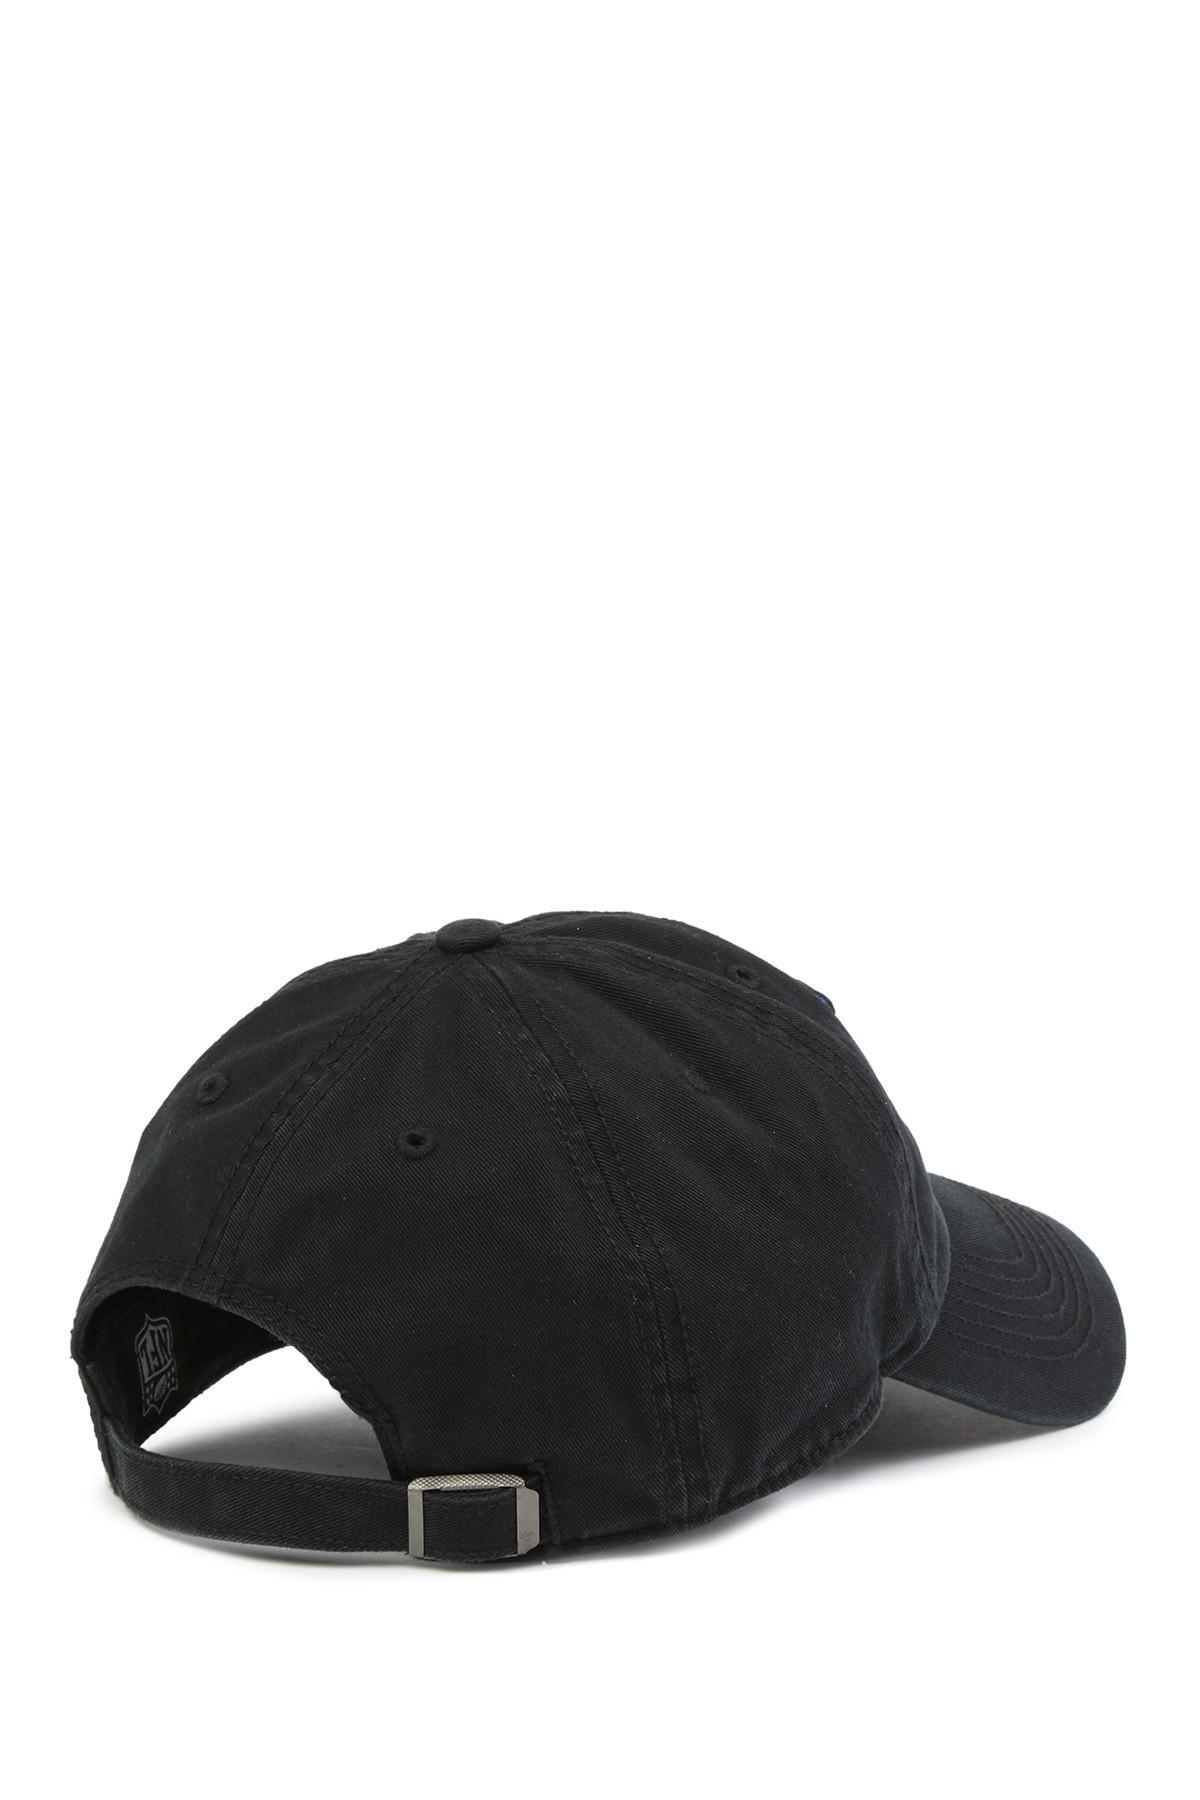 b35d533dc7c7d Lyst - 47 Brand Nfl Ny Giants Huddle 47 Clean Up Cap in Black for Men